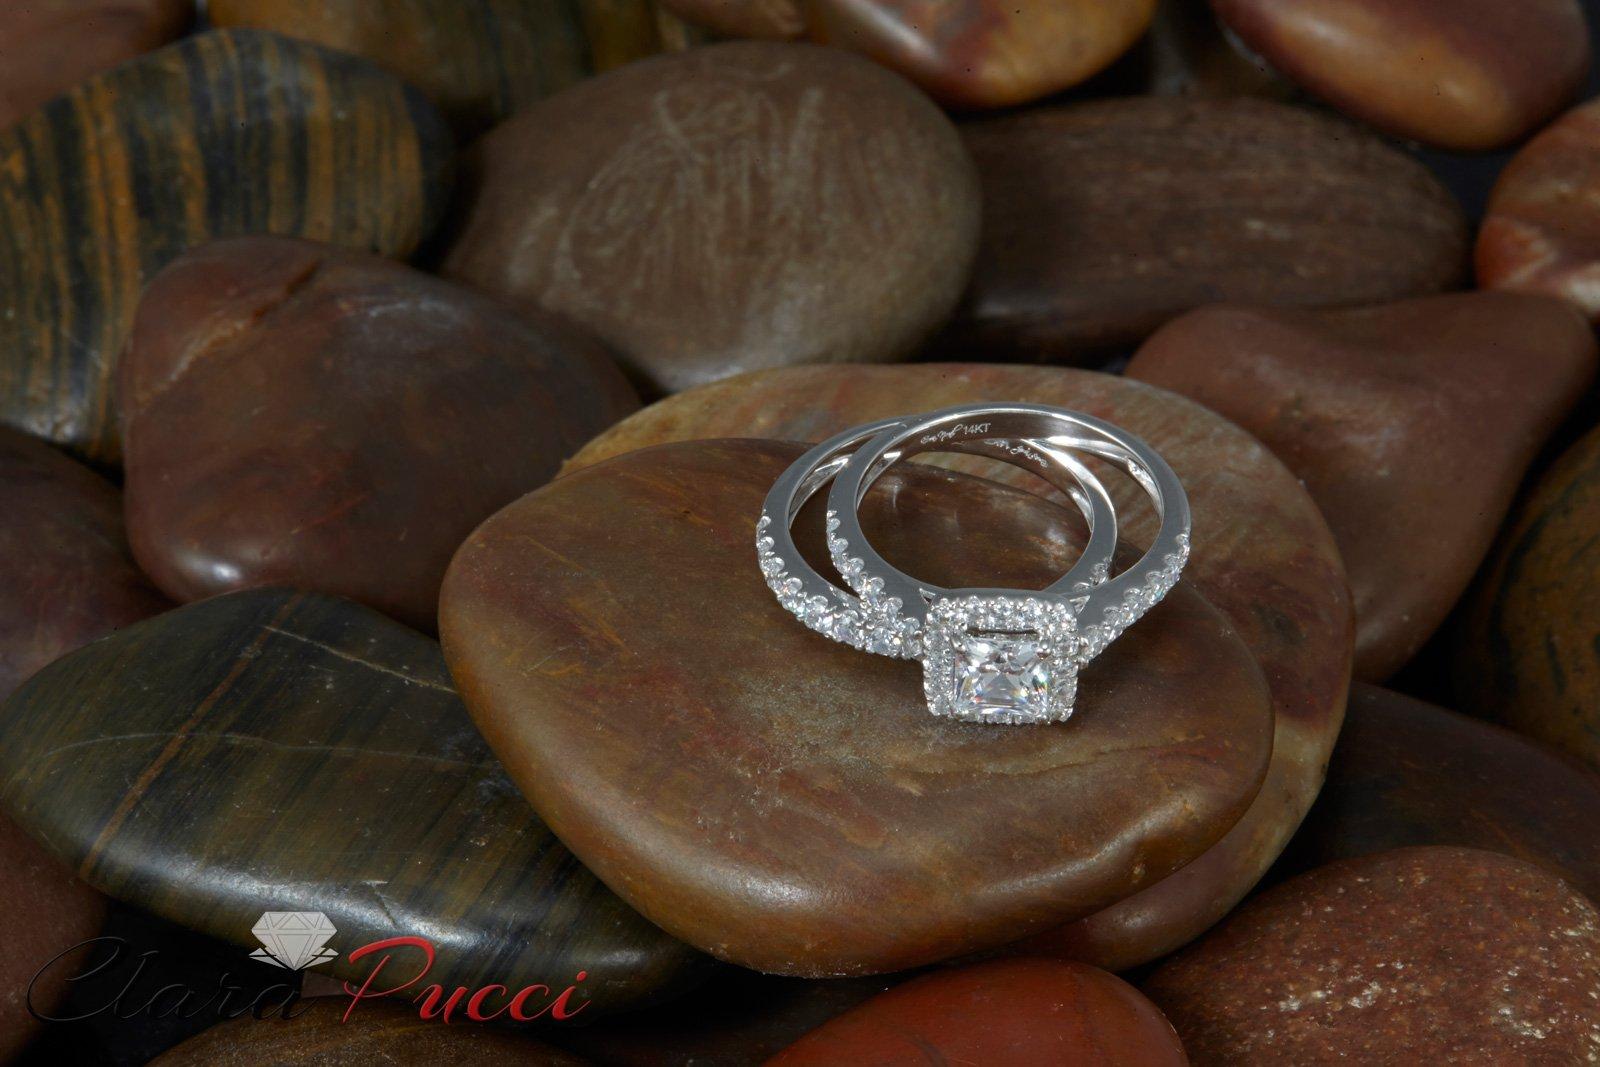 Clara Pucci 1.60 CT Princess Cut CZ Pave Halo Bridal Engagement Wedding Ring Band Set 14k White Gold, Size 8.5 by Clara Pucci (Image #7)